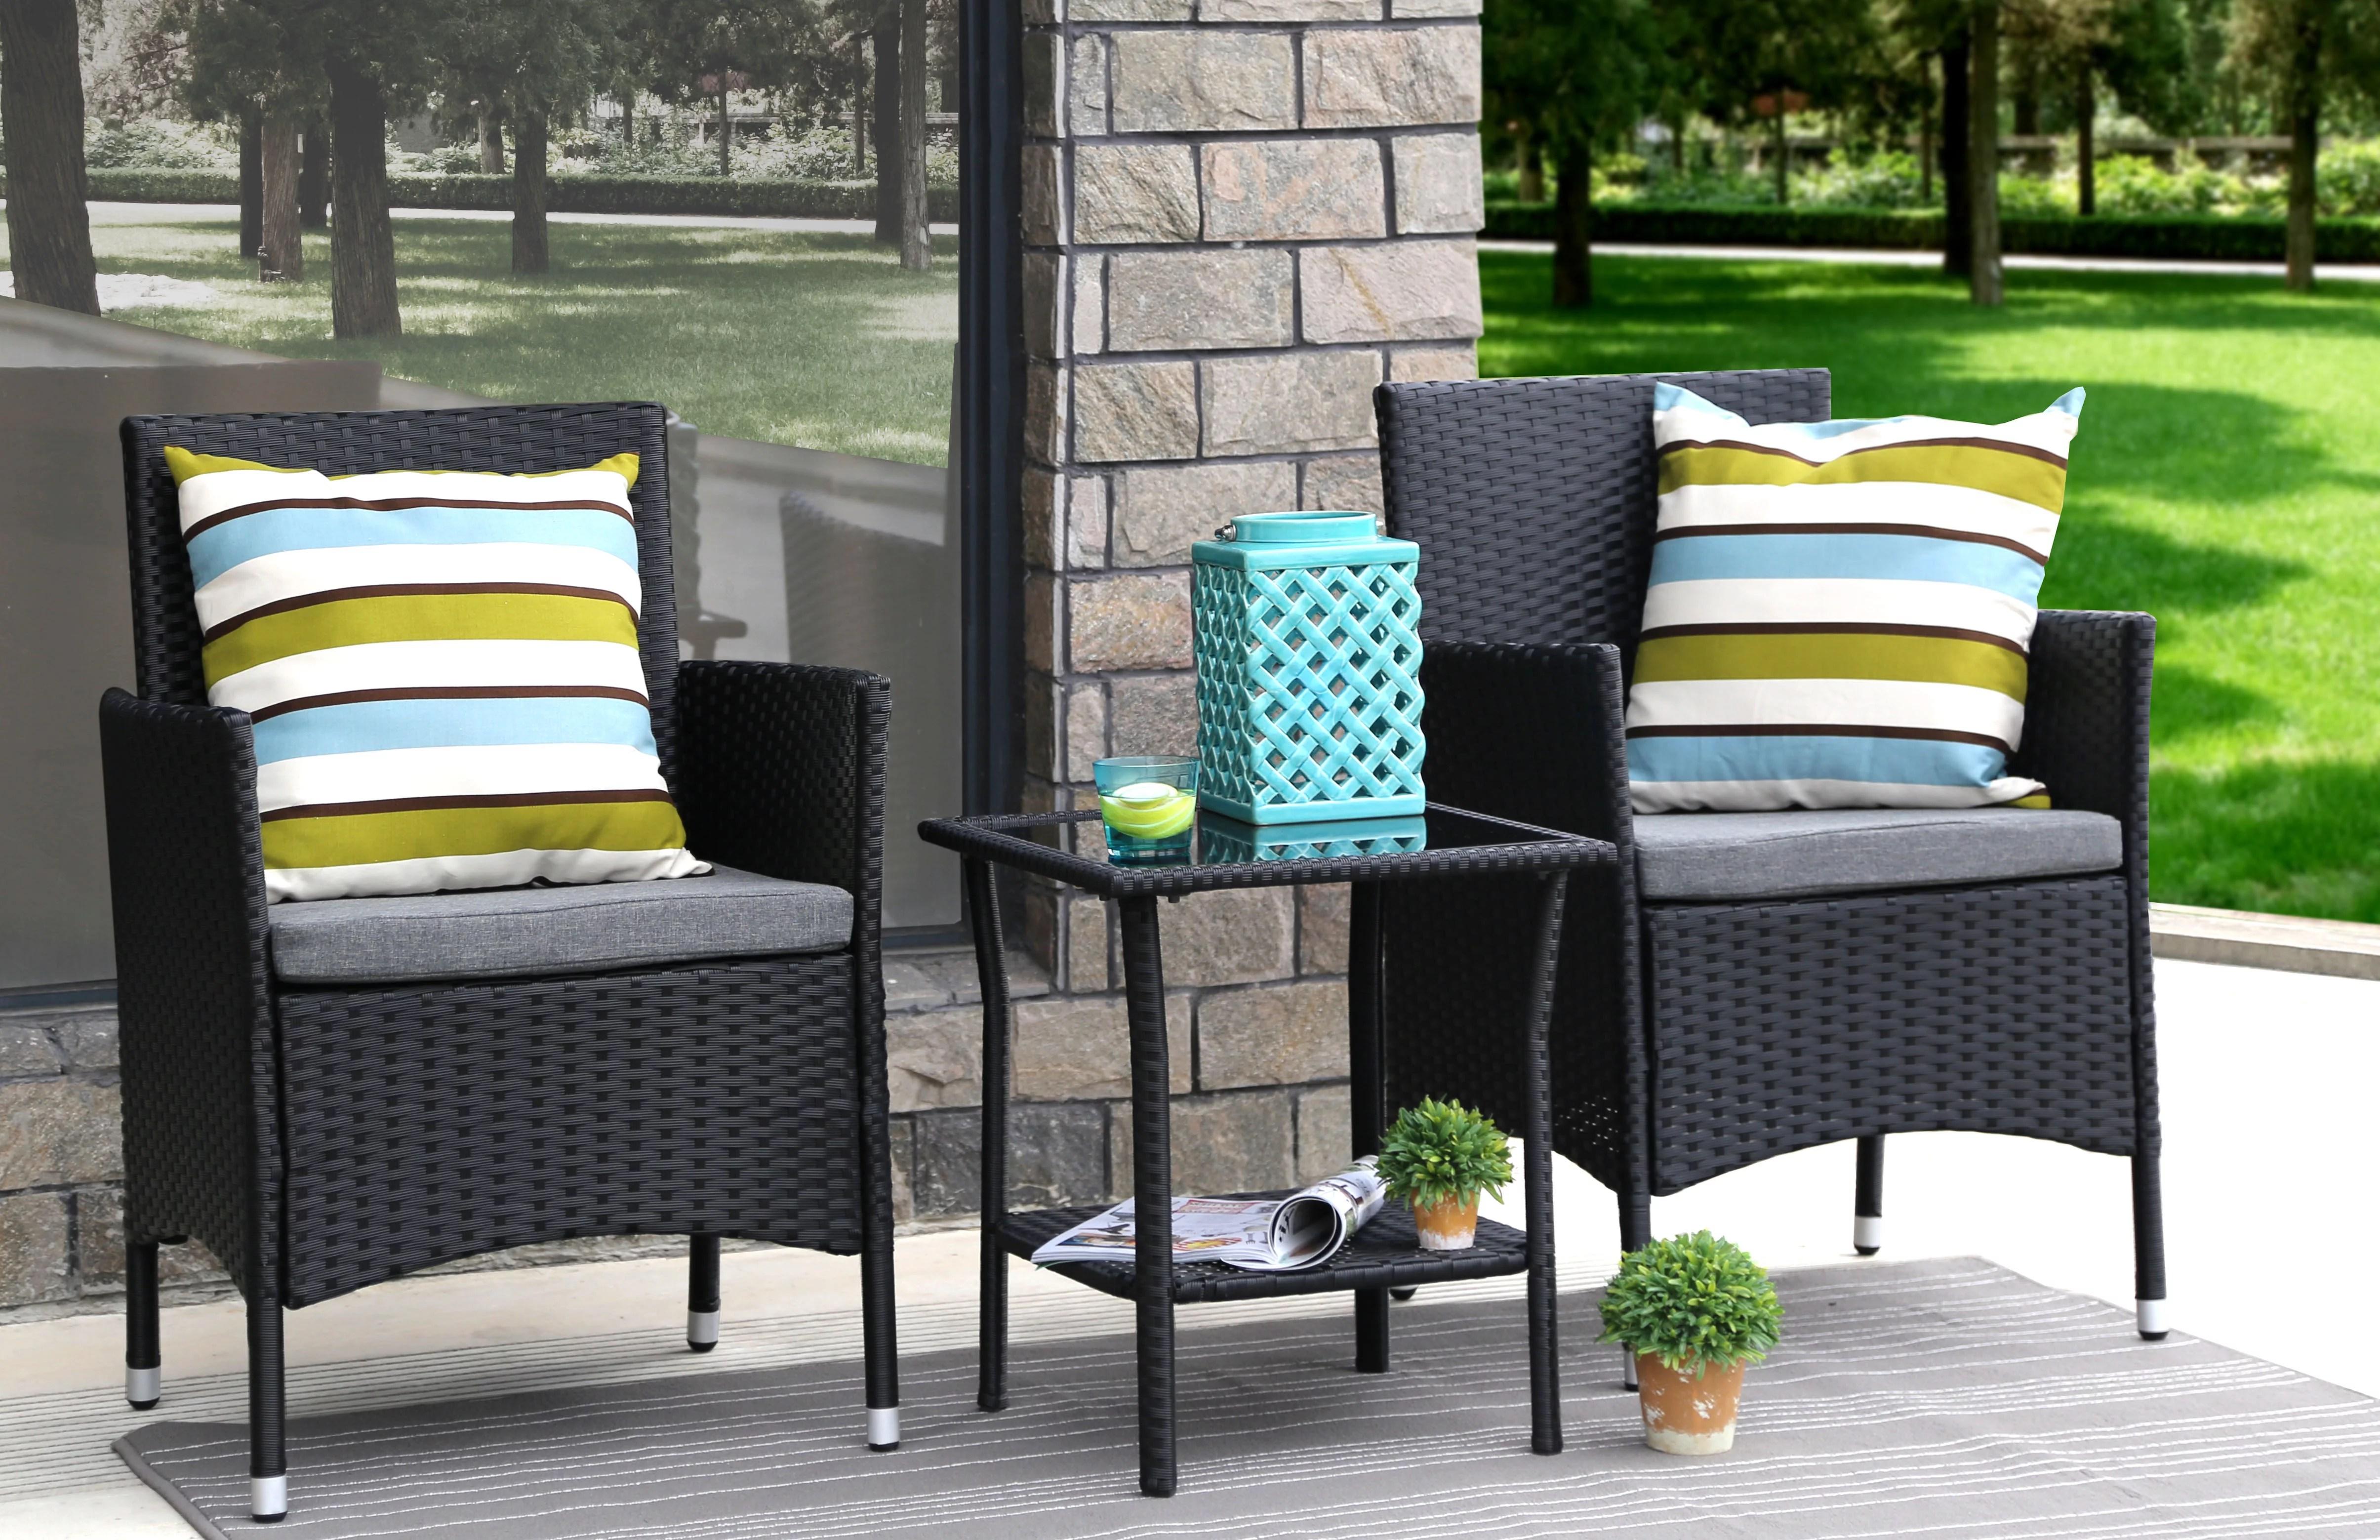 baner garden outdoor furniture complete patio cushion pe wicker rattan garden dining set black 3 pieces